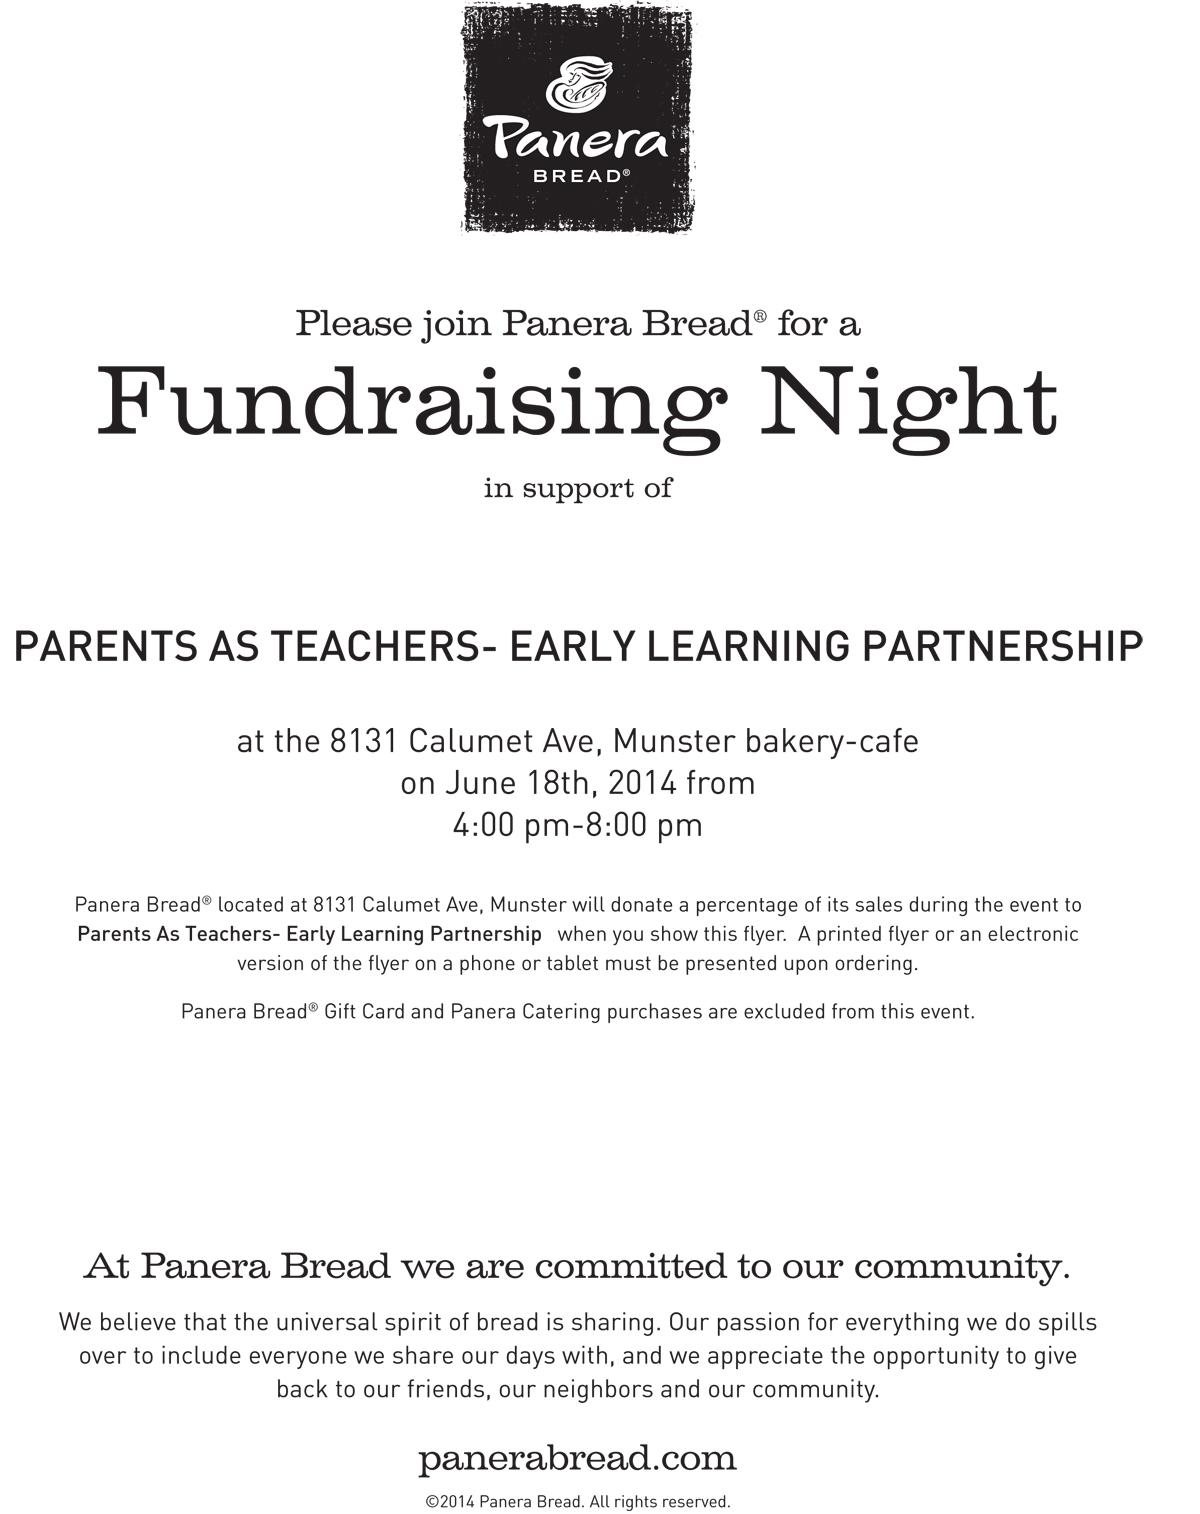 Parents as Teachers Fundraising Night at Munster Panera Bread